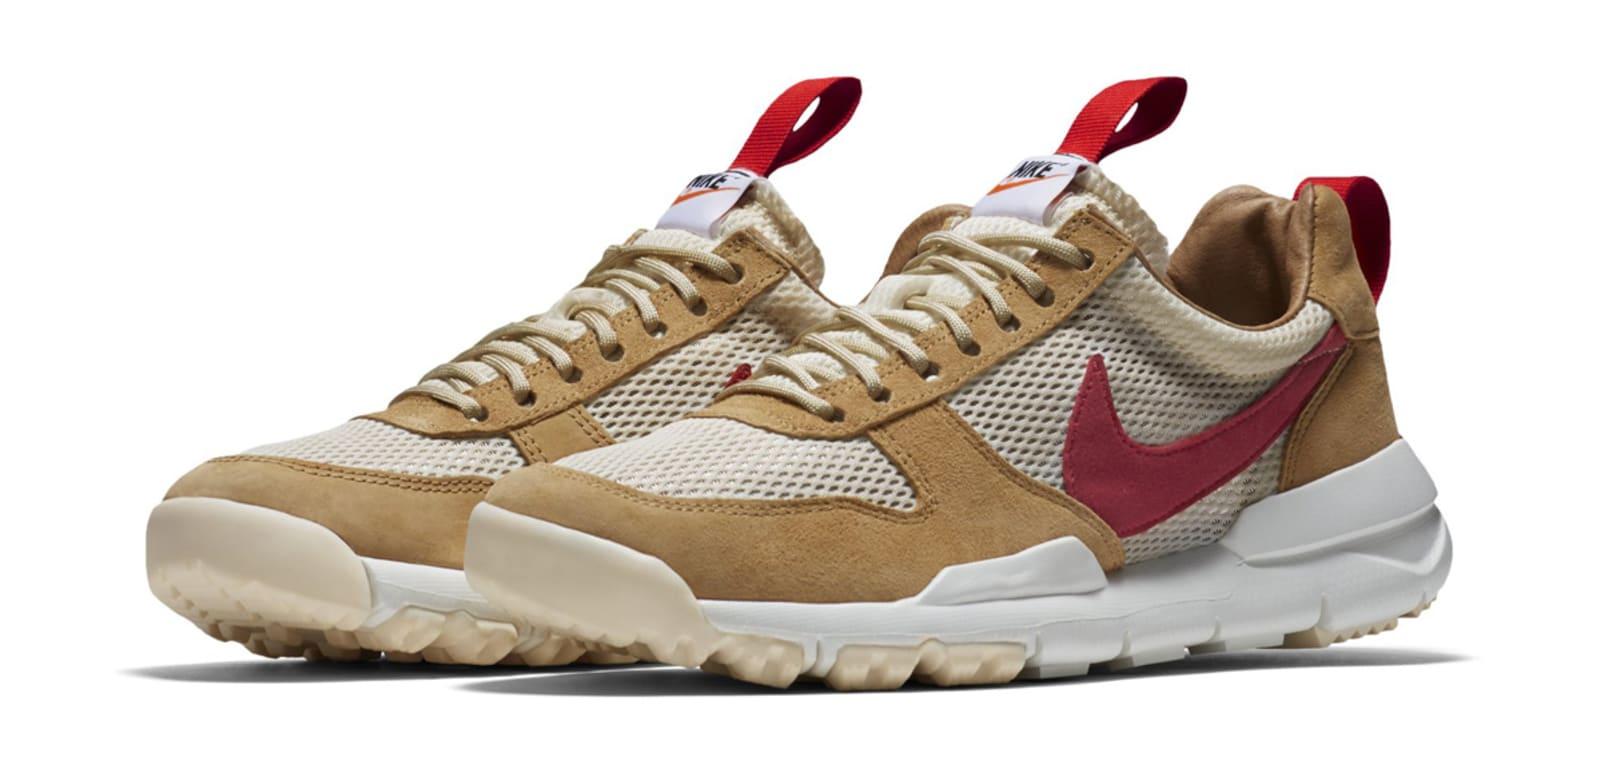 Tom Sachs x Nike Mars Yard 2.5 Rumored For This Year